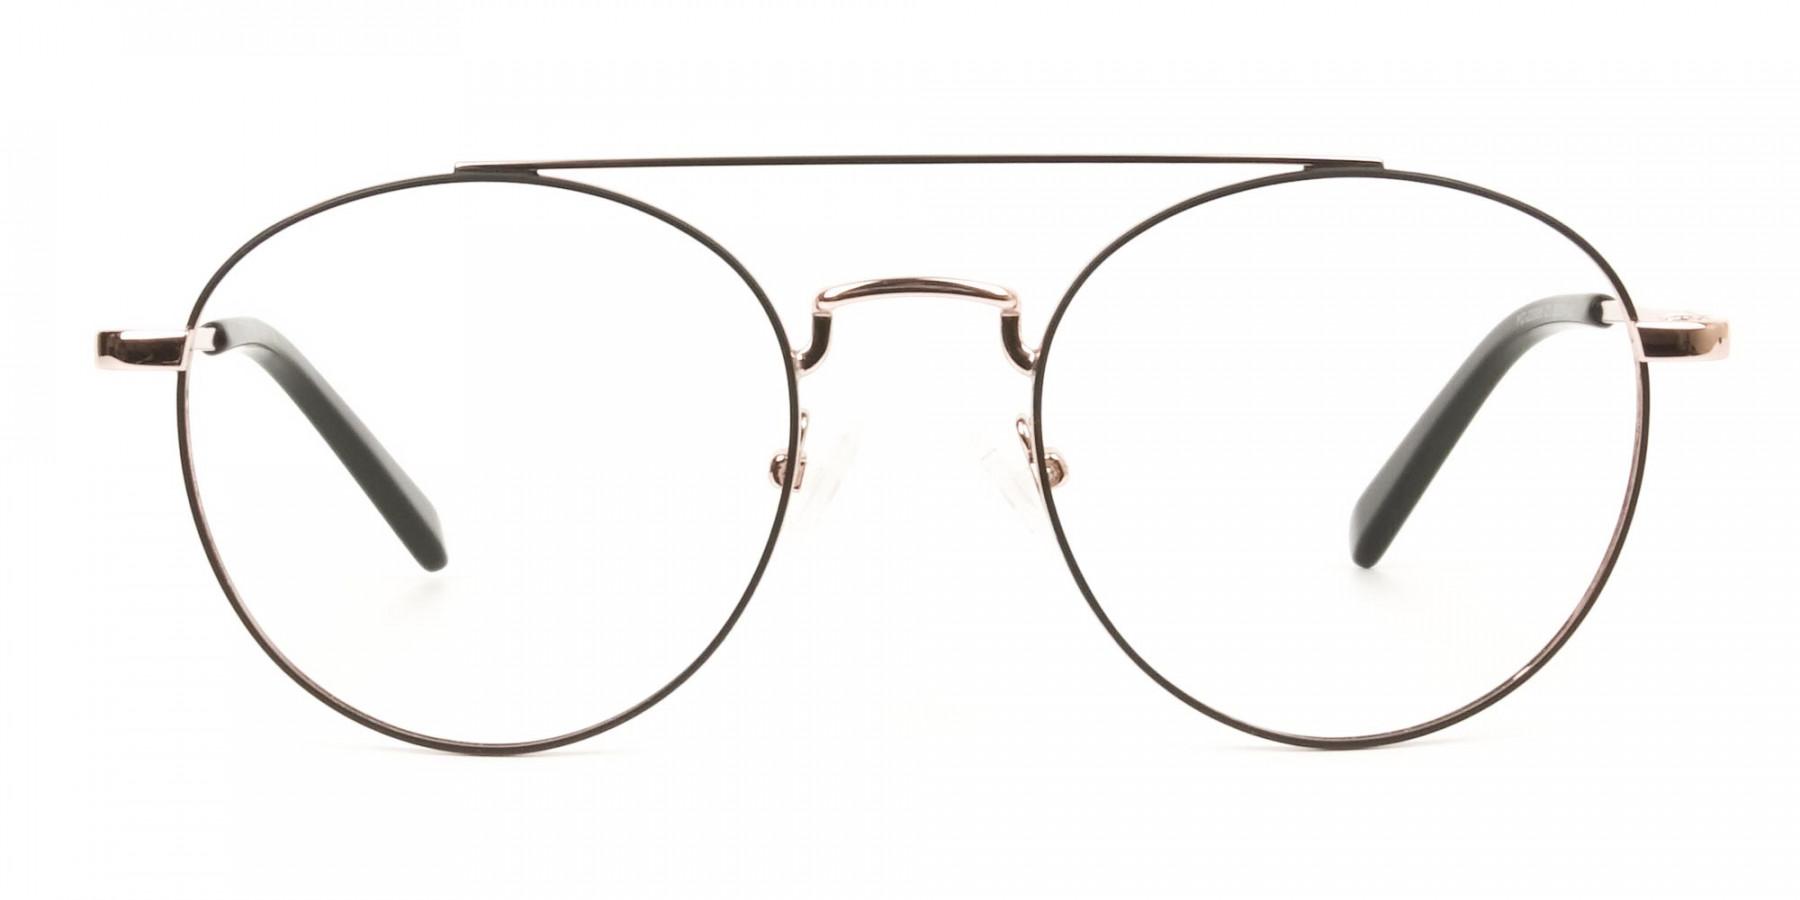 Black & Rose Gold Round Aviator Glasses - 1